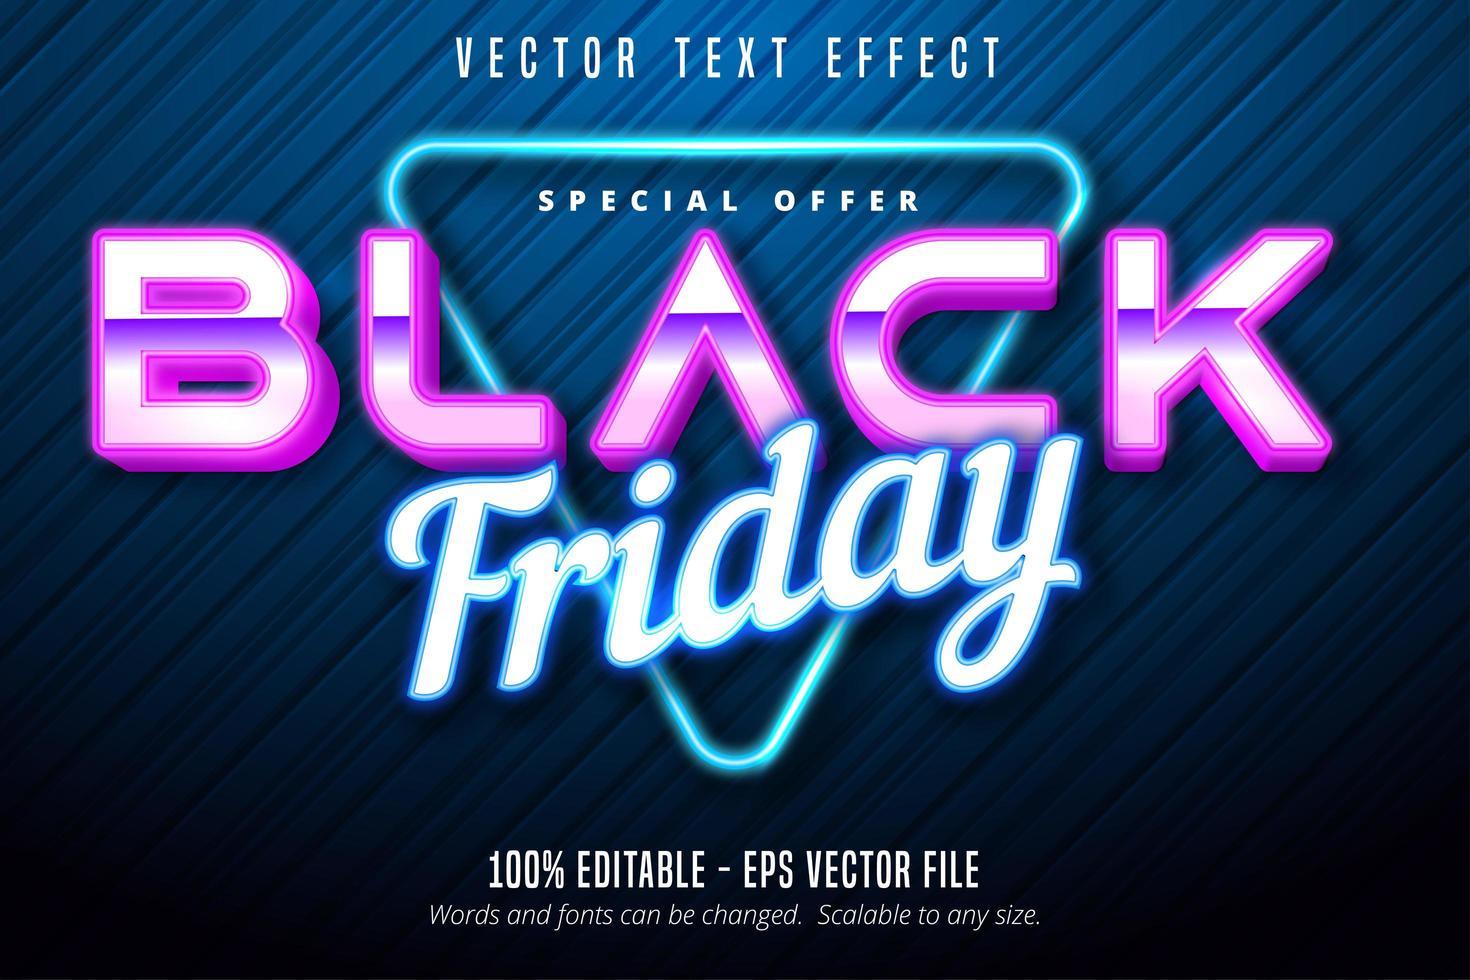 efecto de texto editable de luz de neón de viernes negro vector